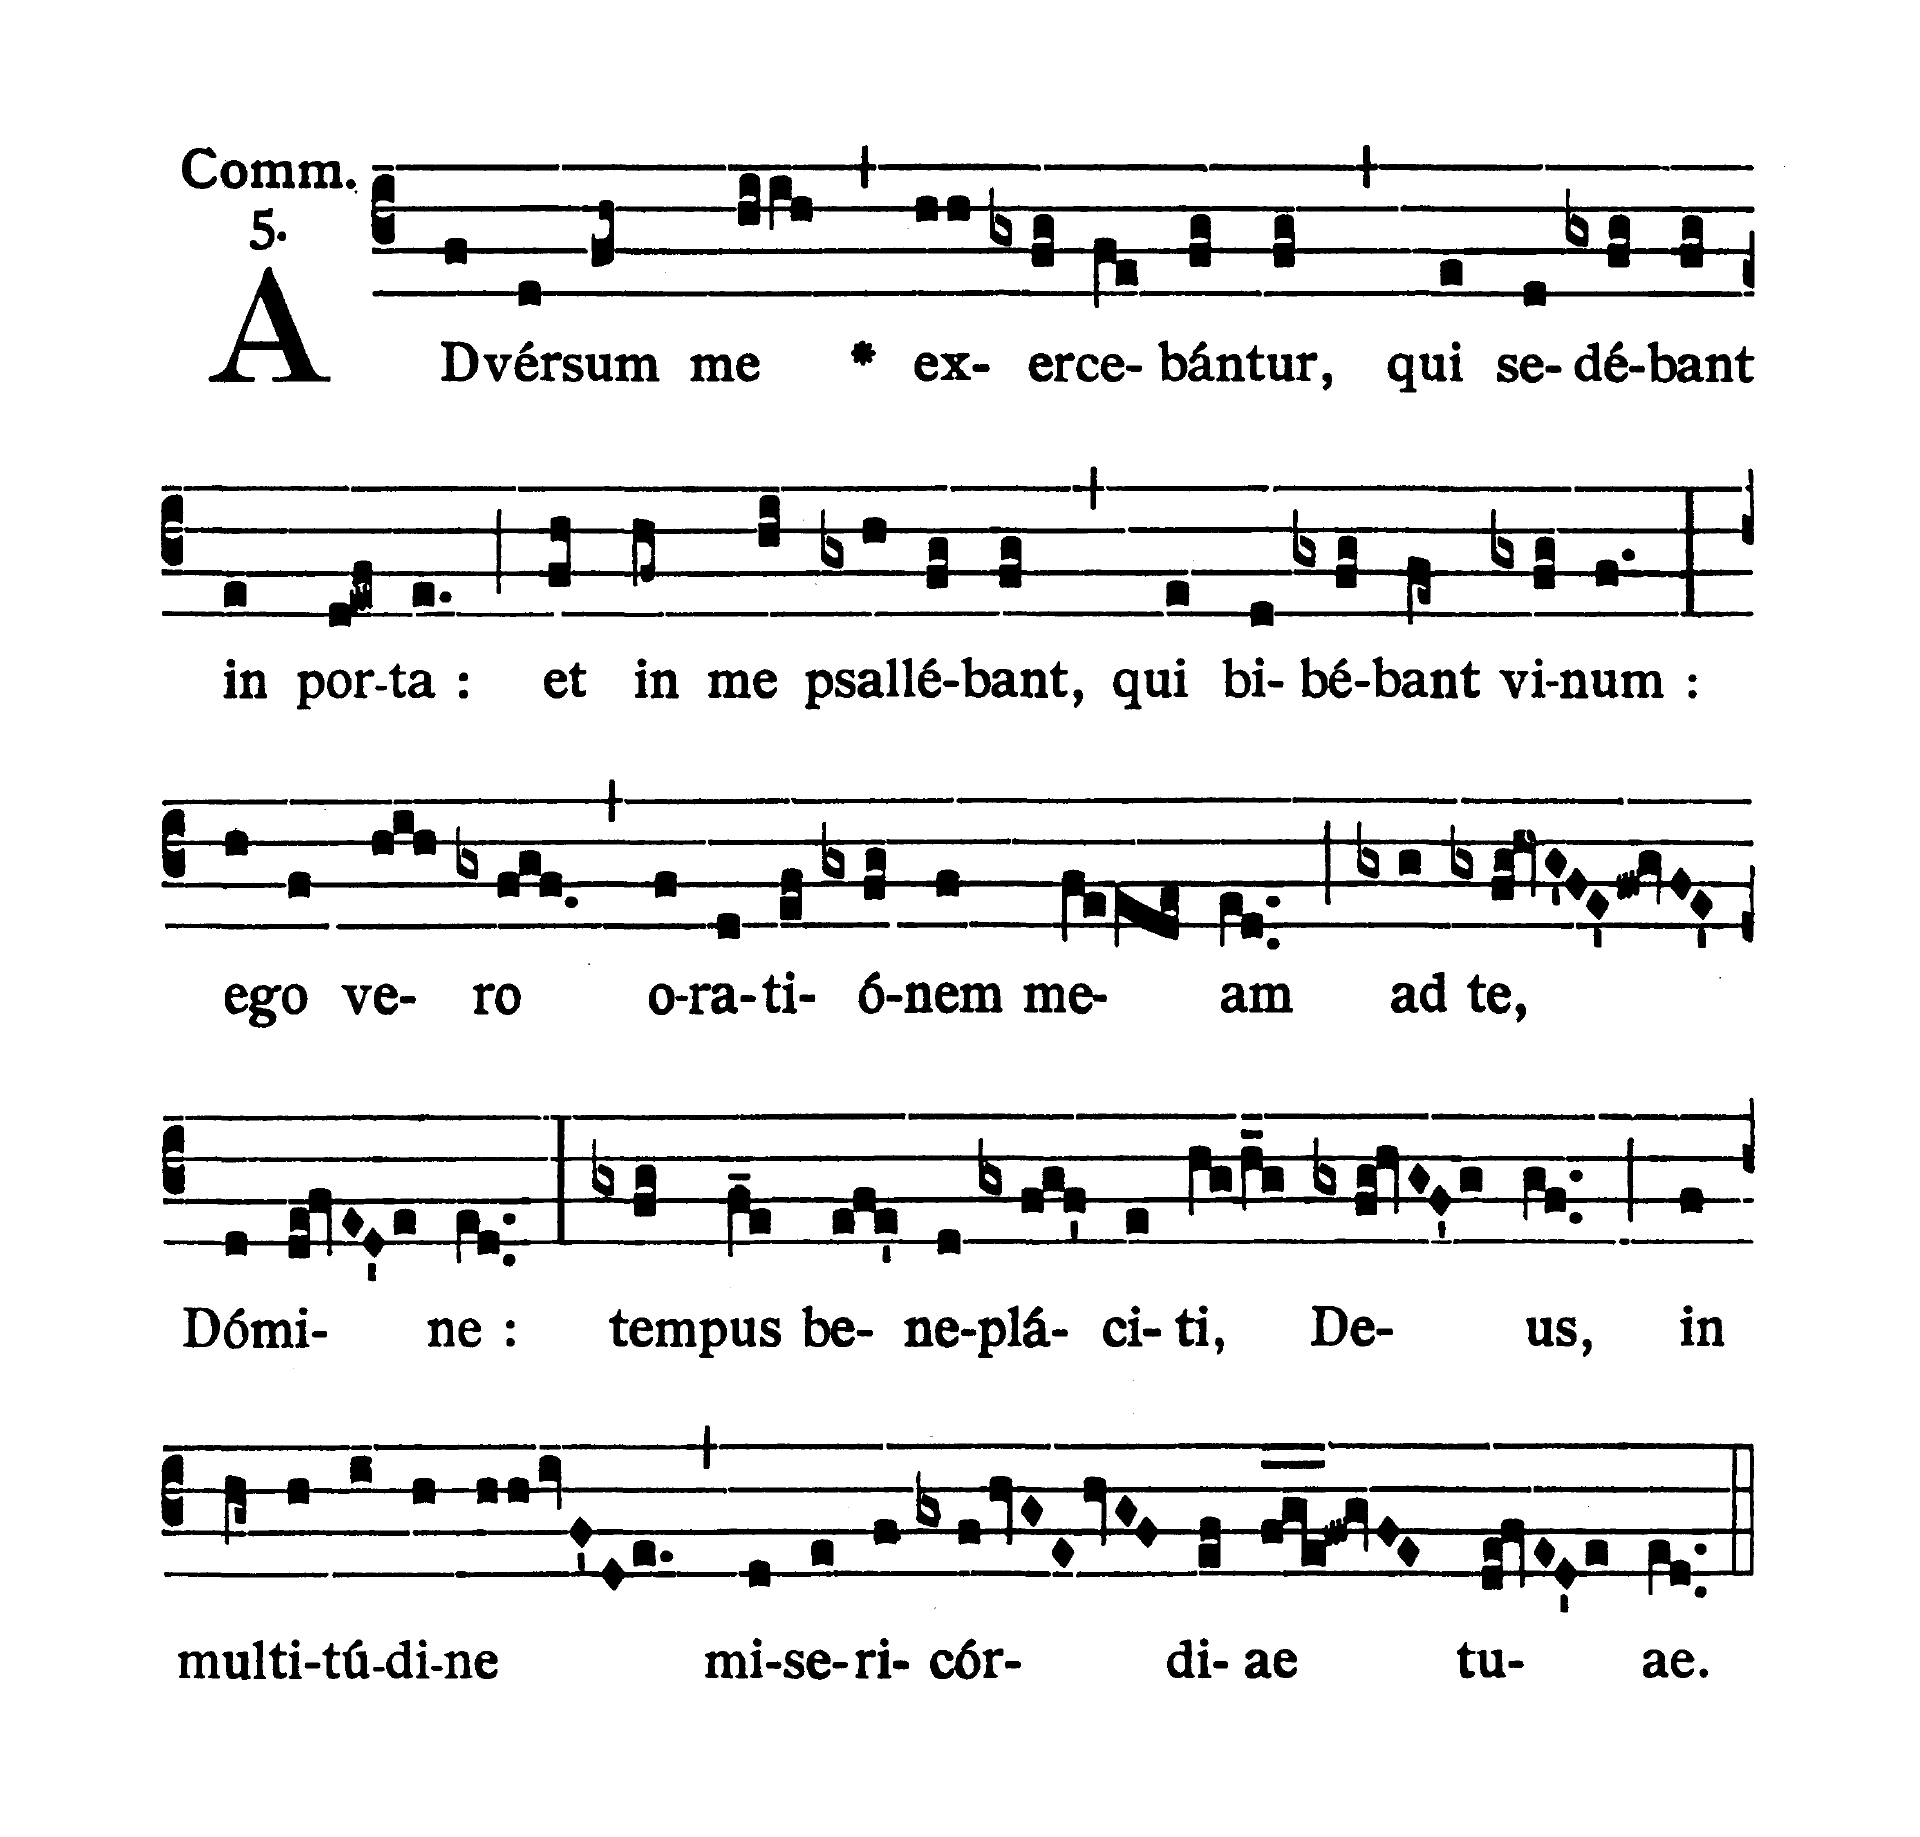 Feria III Hebdomadae Sanctae (Tuesday of Holy Week) - Communio (Adversum me exercebantur)